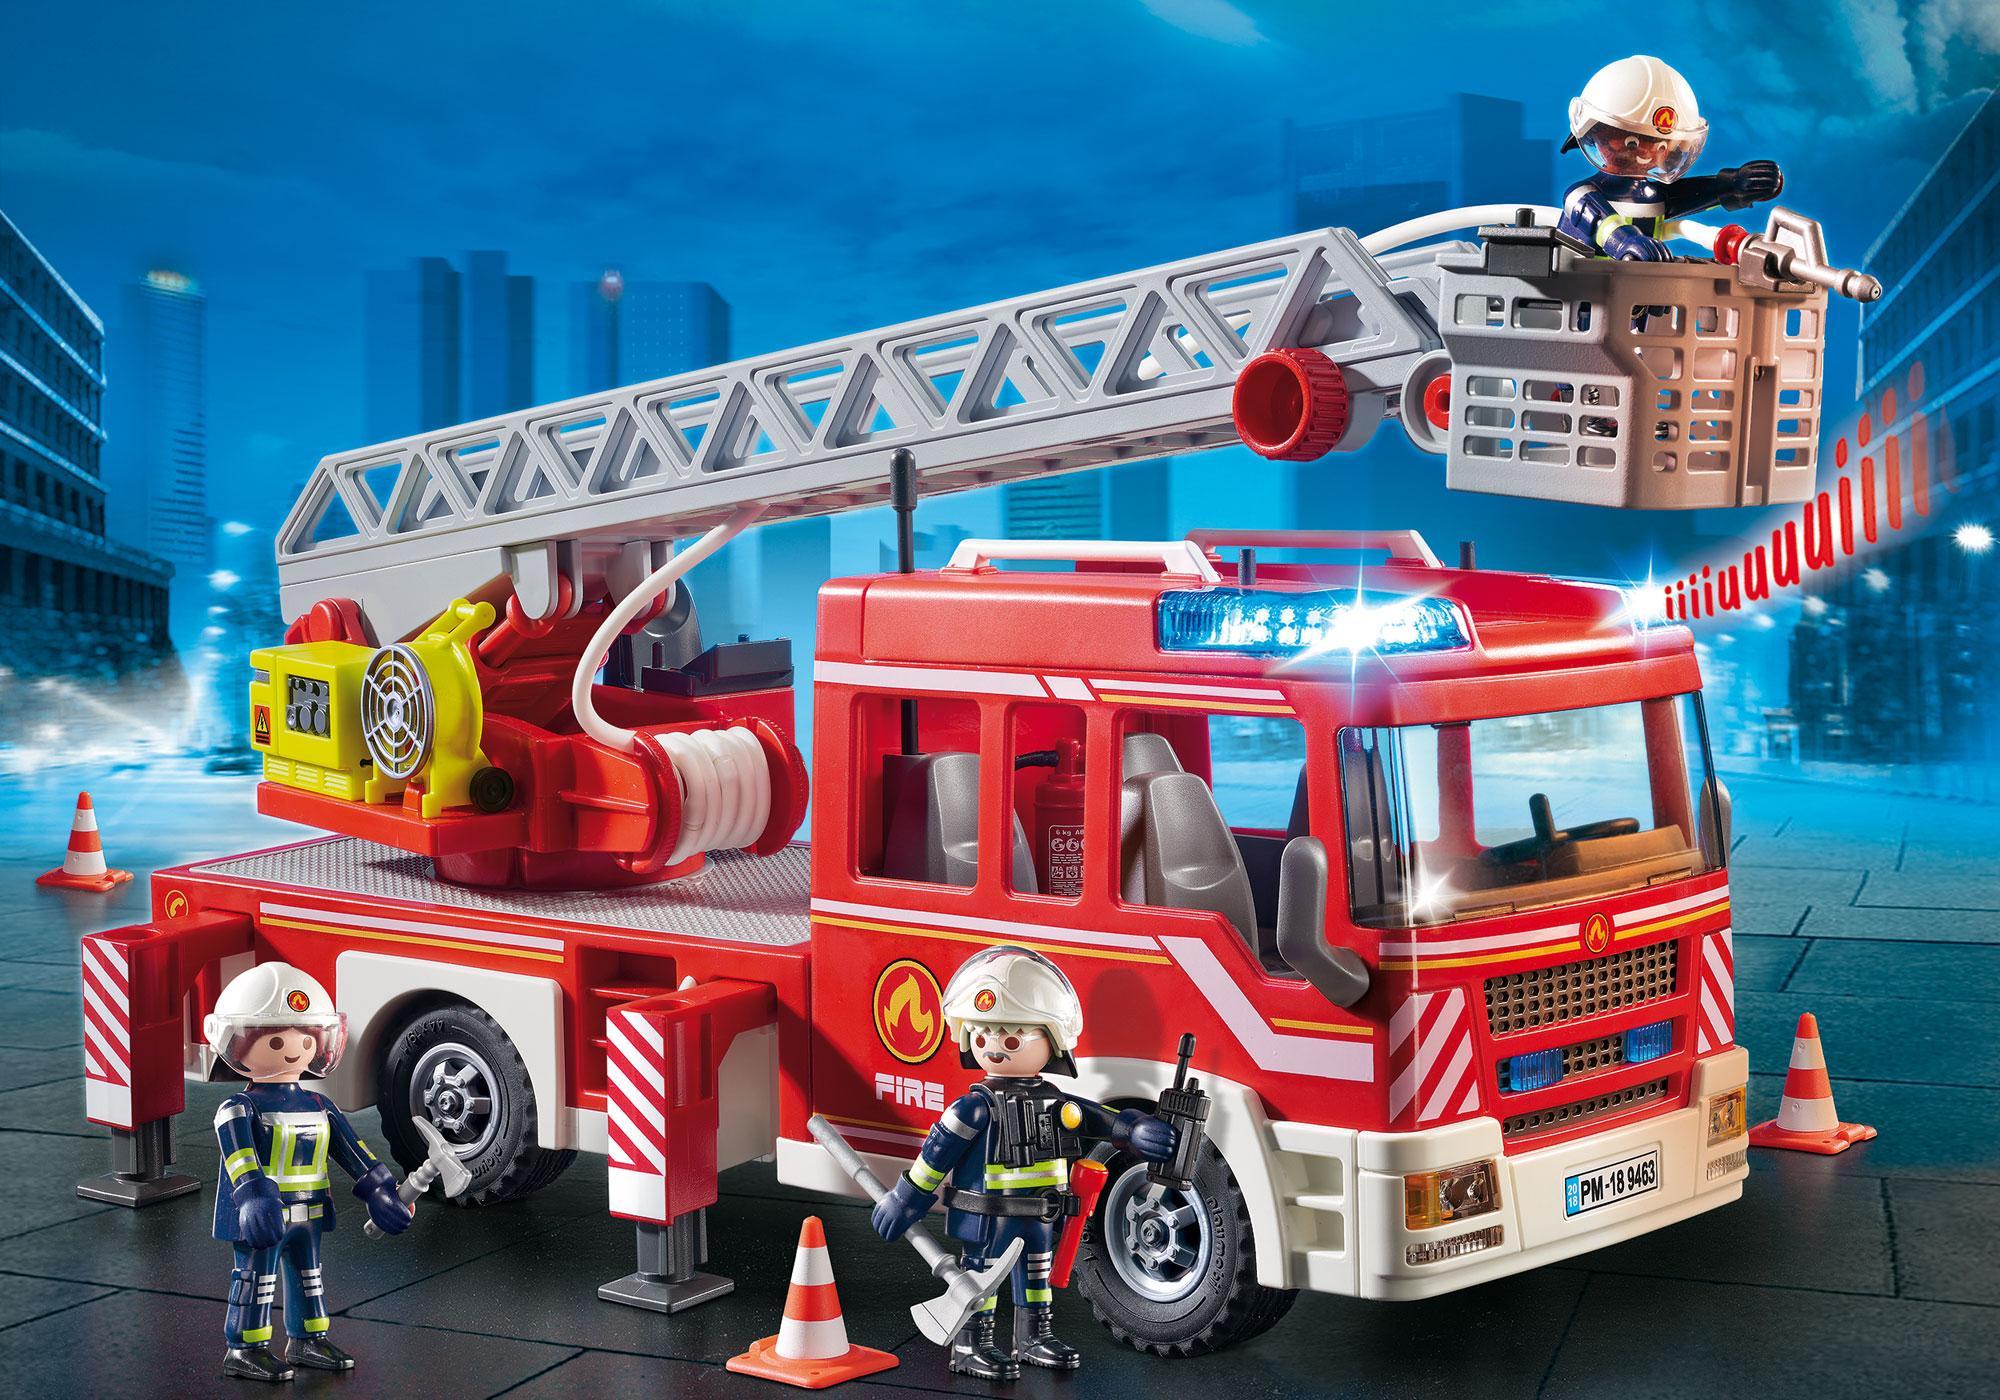 http://media.playmobil.com/i/playmobil/9463_product_detail/Όχημα Πυροσβεστικής με σκάλα και καλάθι διάσωσης